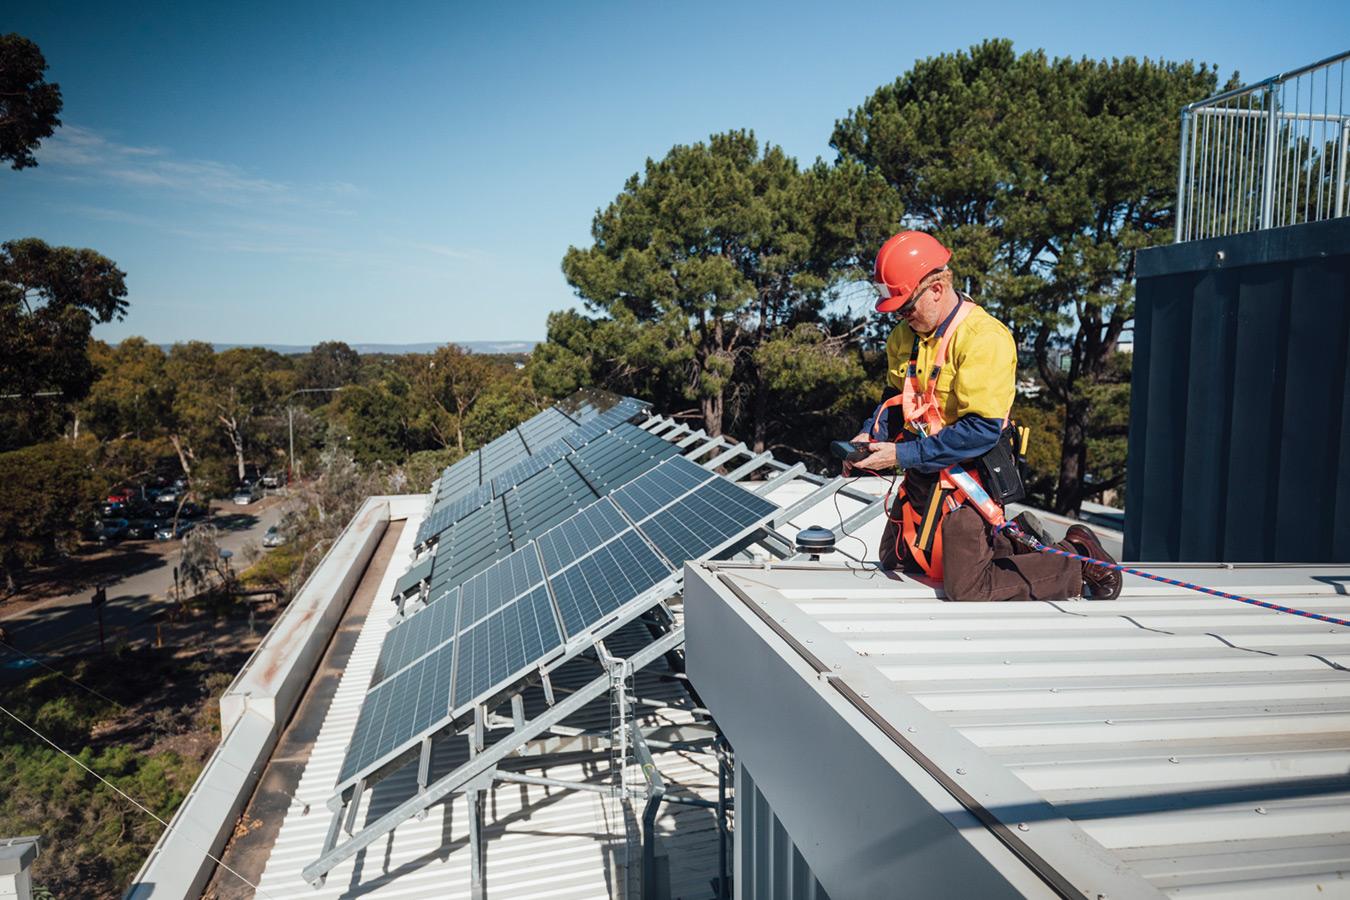 Leading Solar Companies Unite